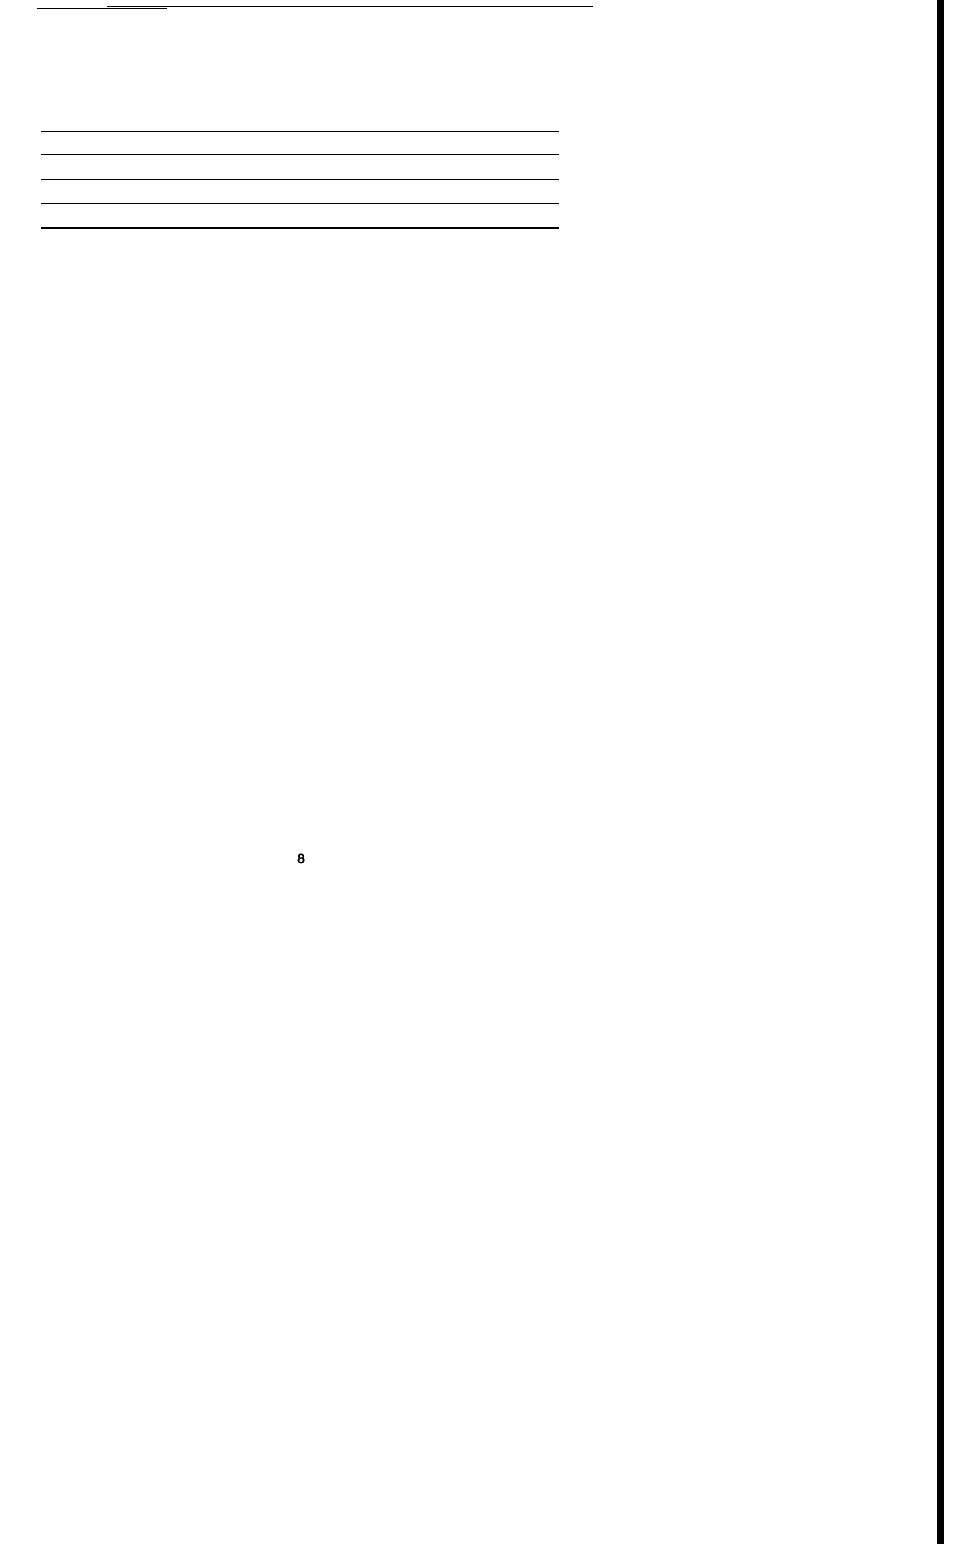 Brewing Coffee Mr Coffee Ck24 User Manual Page 8 36